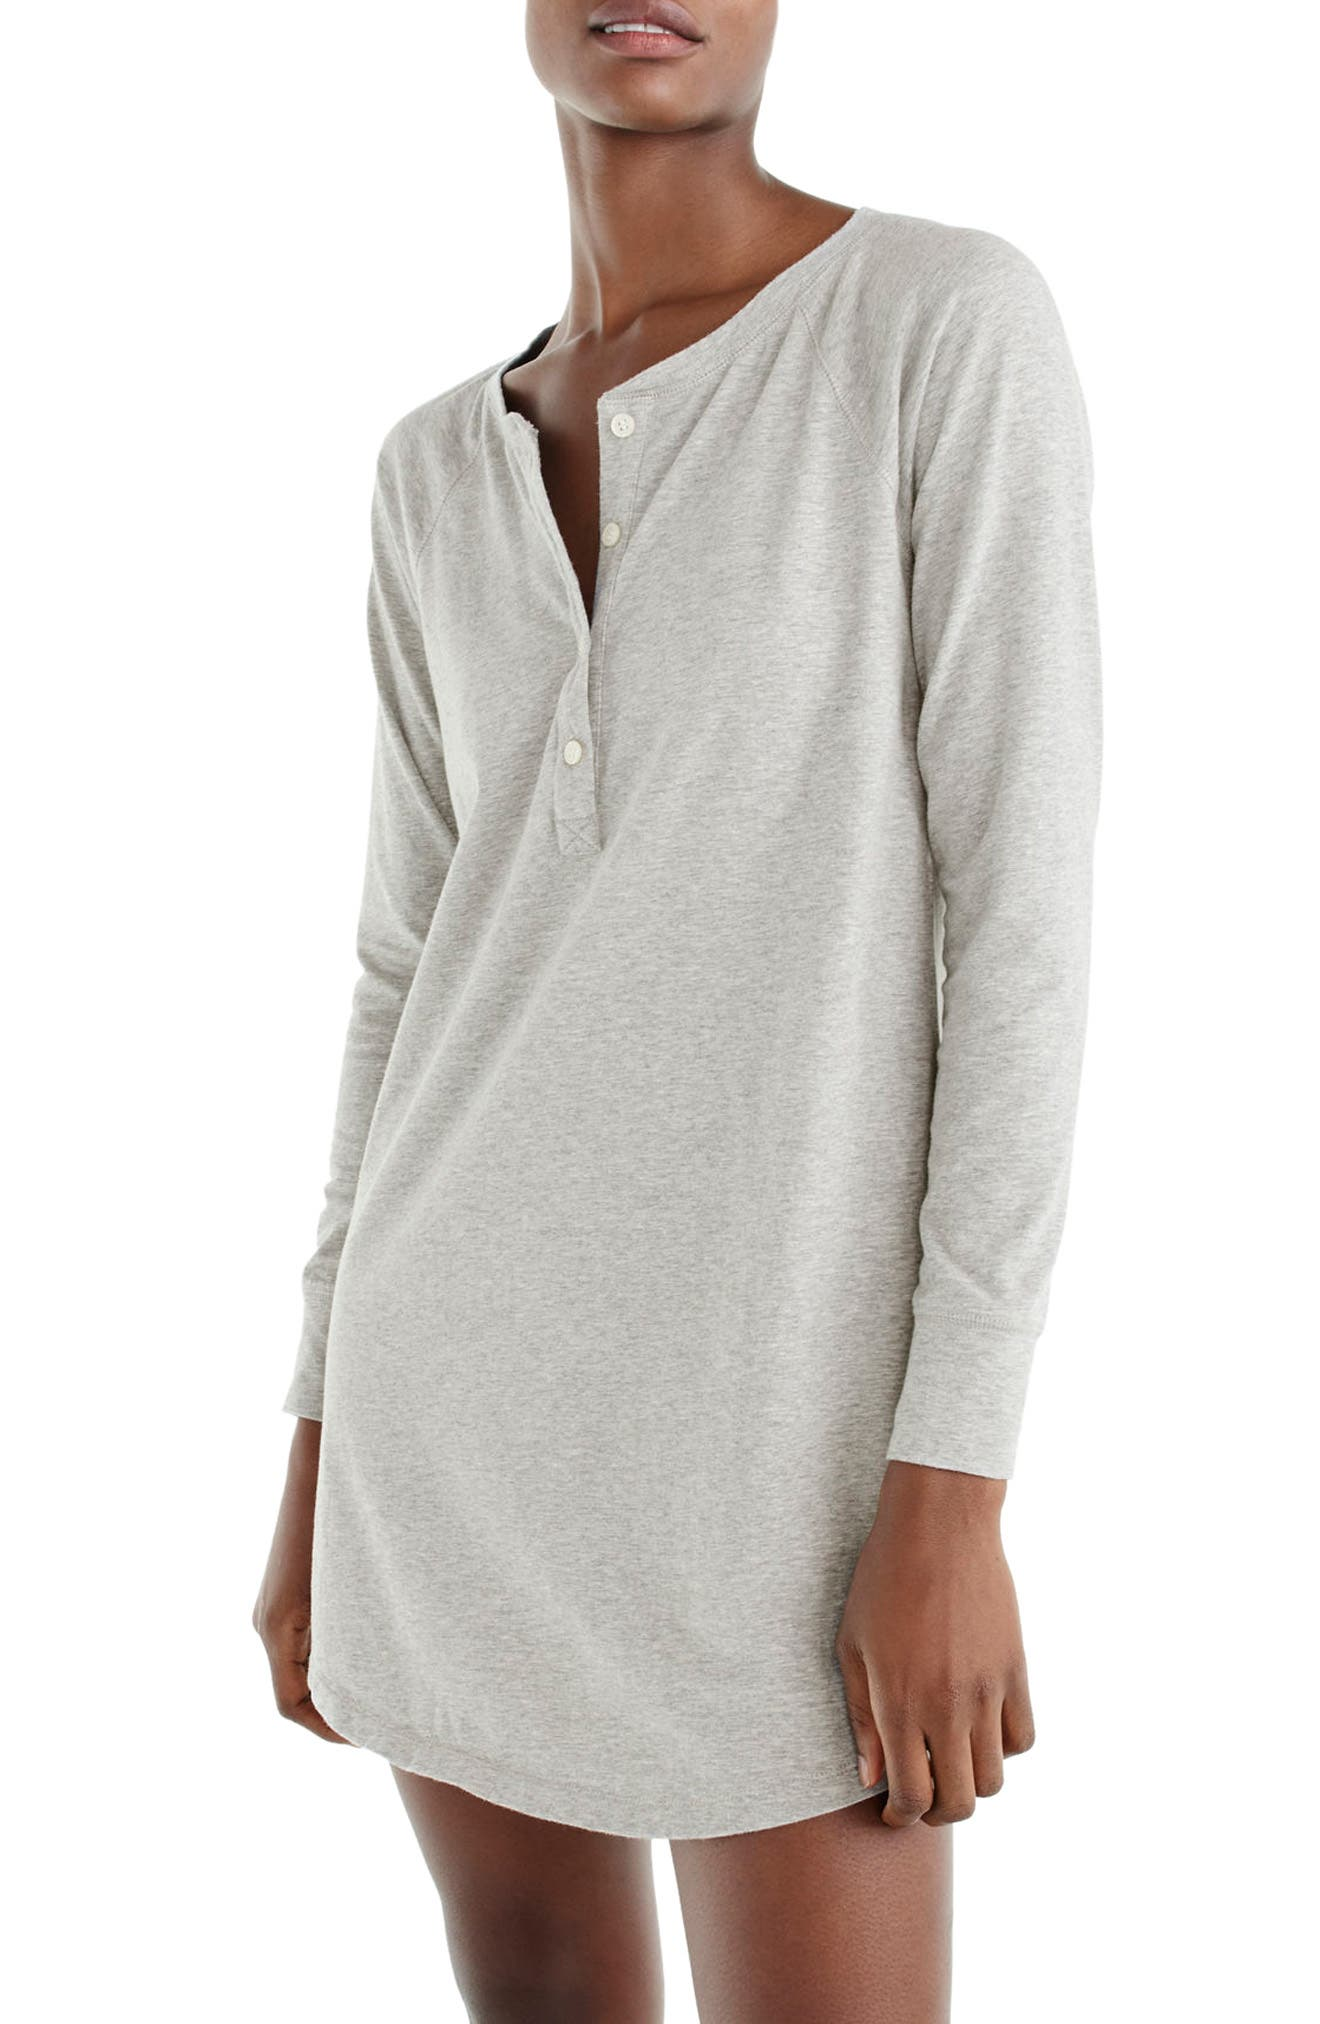 J.Crew Knit Sleep Shirt,                         Main,                         color, Heather Grey